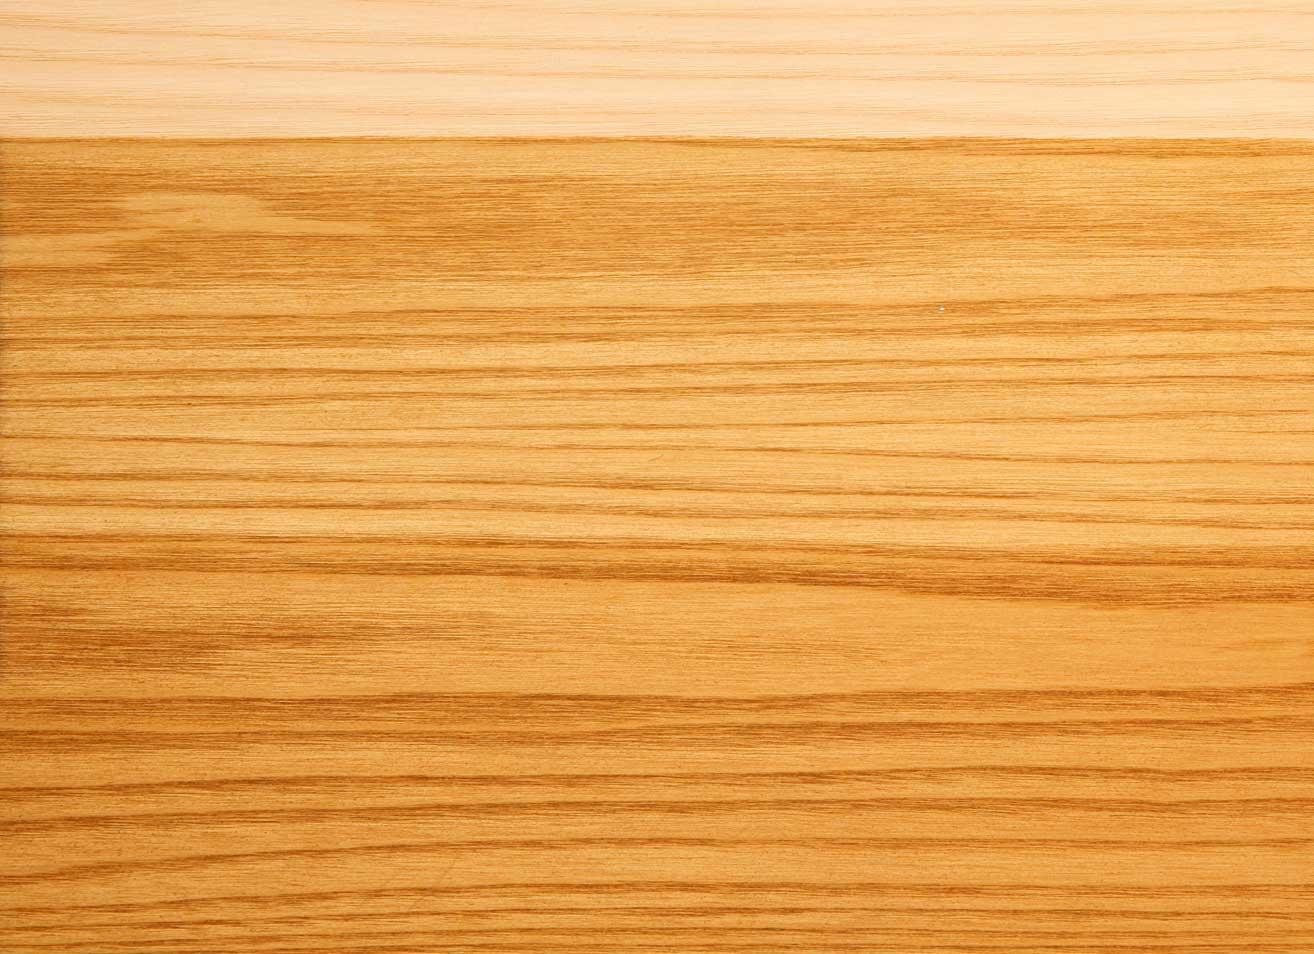 Acabado para madera poro abierto pintar - Pintura blanca para madera exterior ...